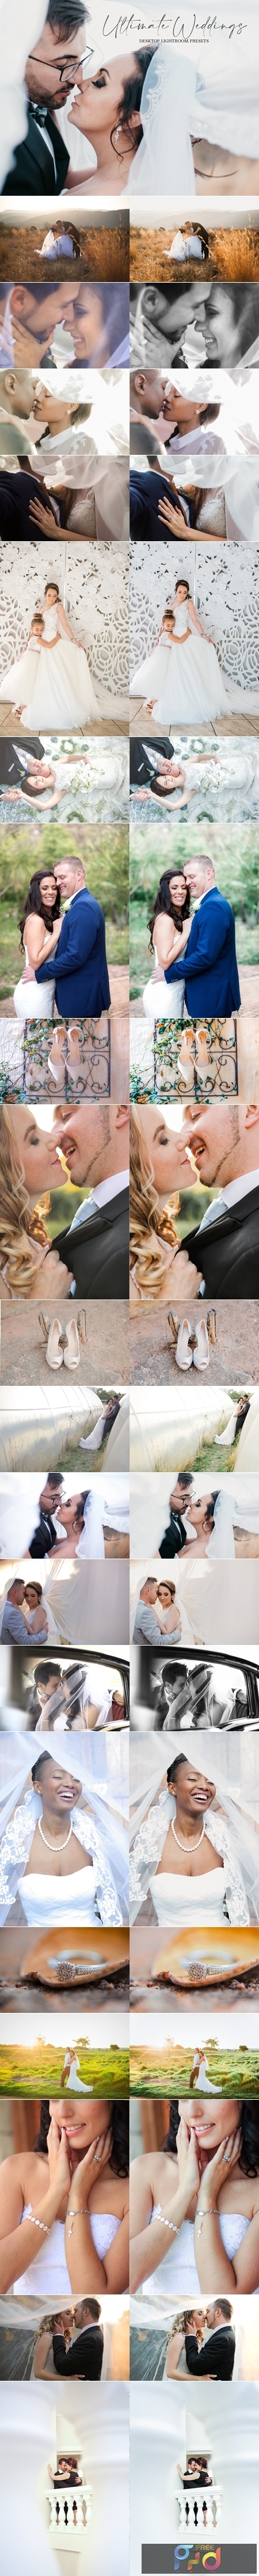 Premium Wedding Preset Collection 4477819 1